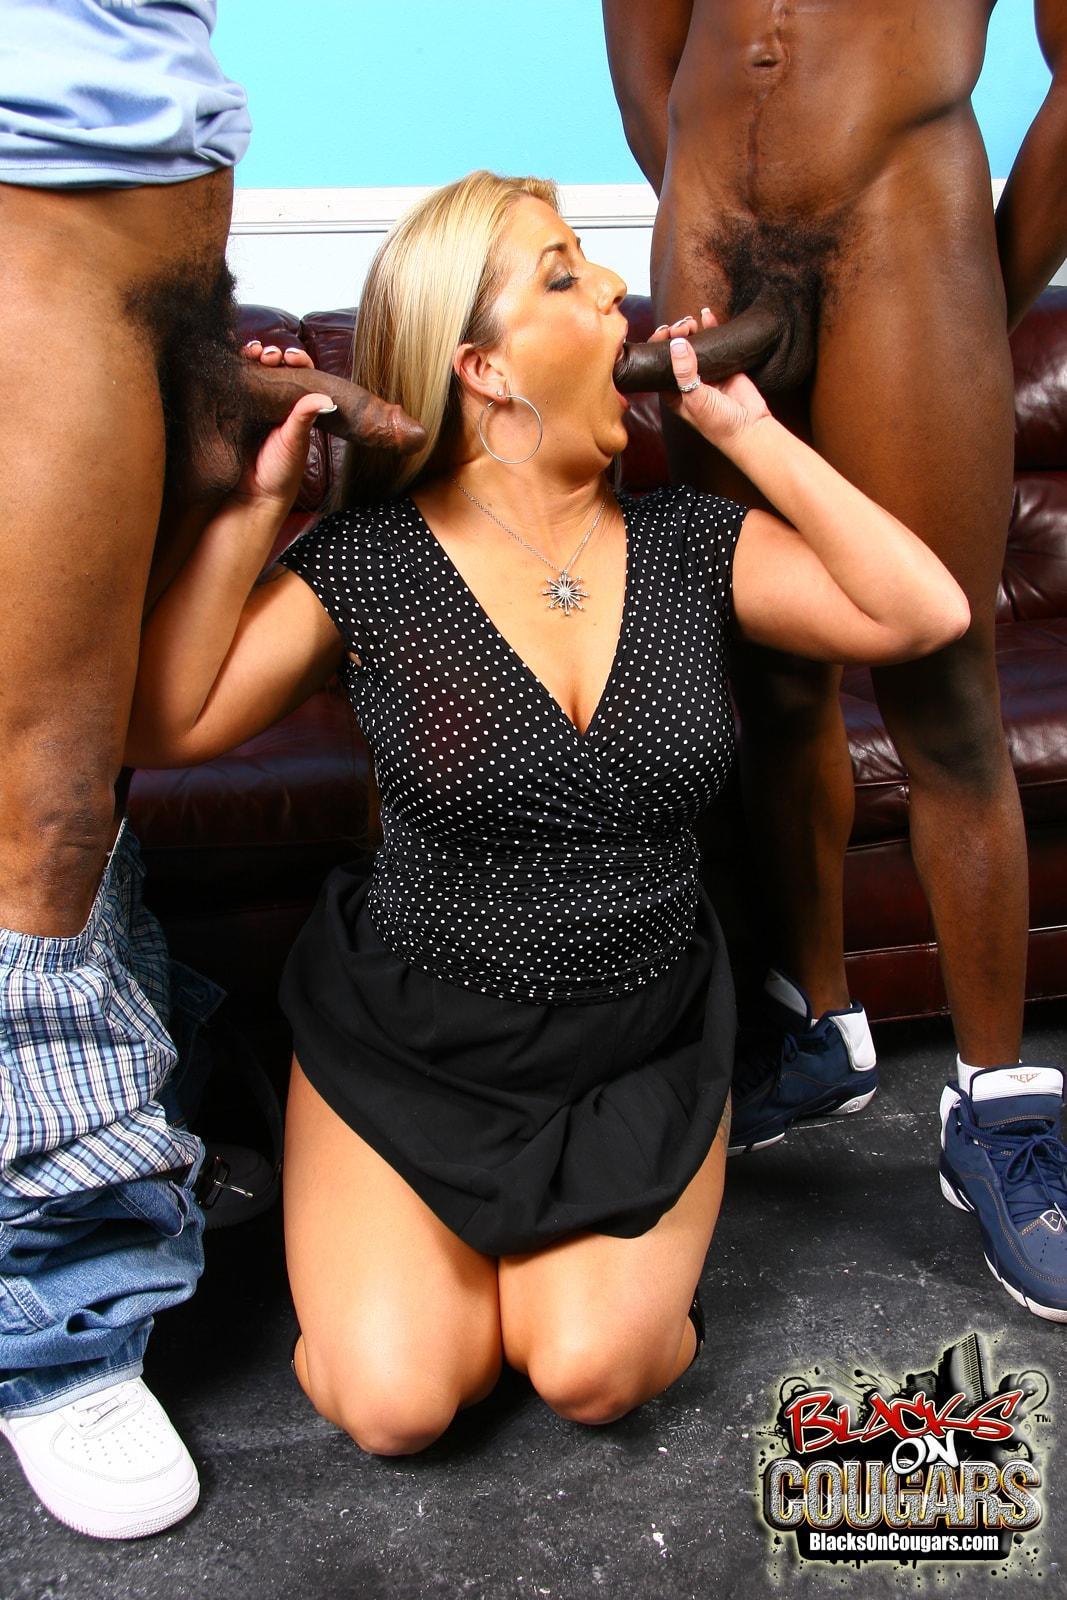 Dogfart '- Blacks On Cougars' starring Joclyn Stone (Photo 15)